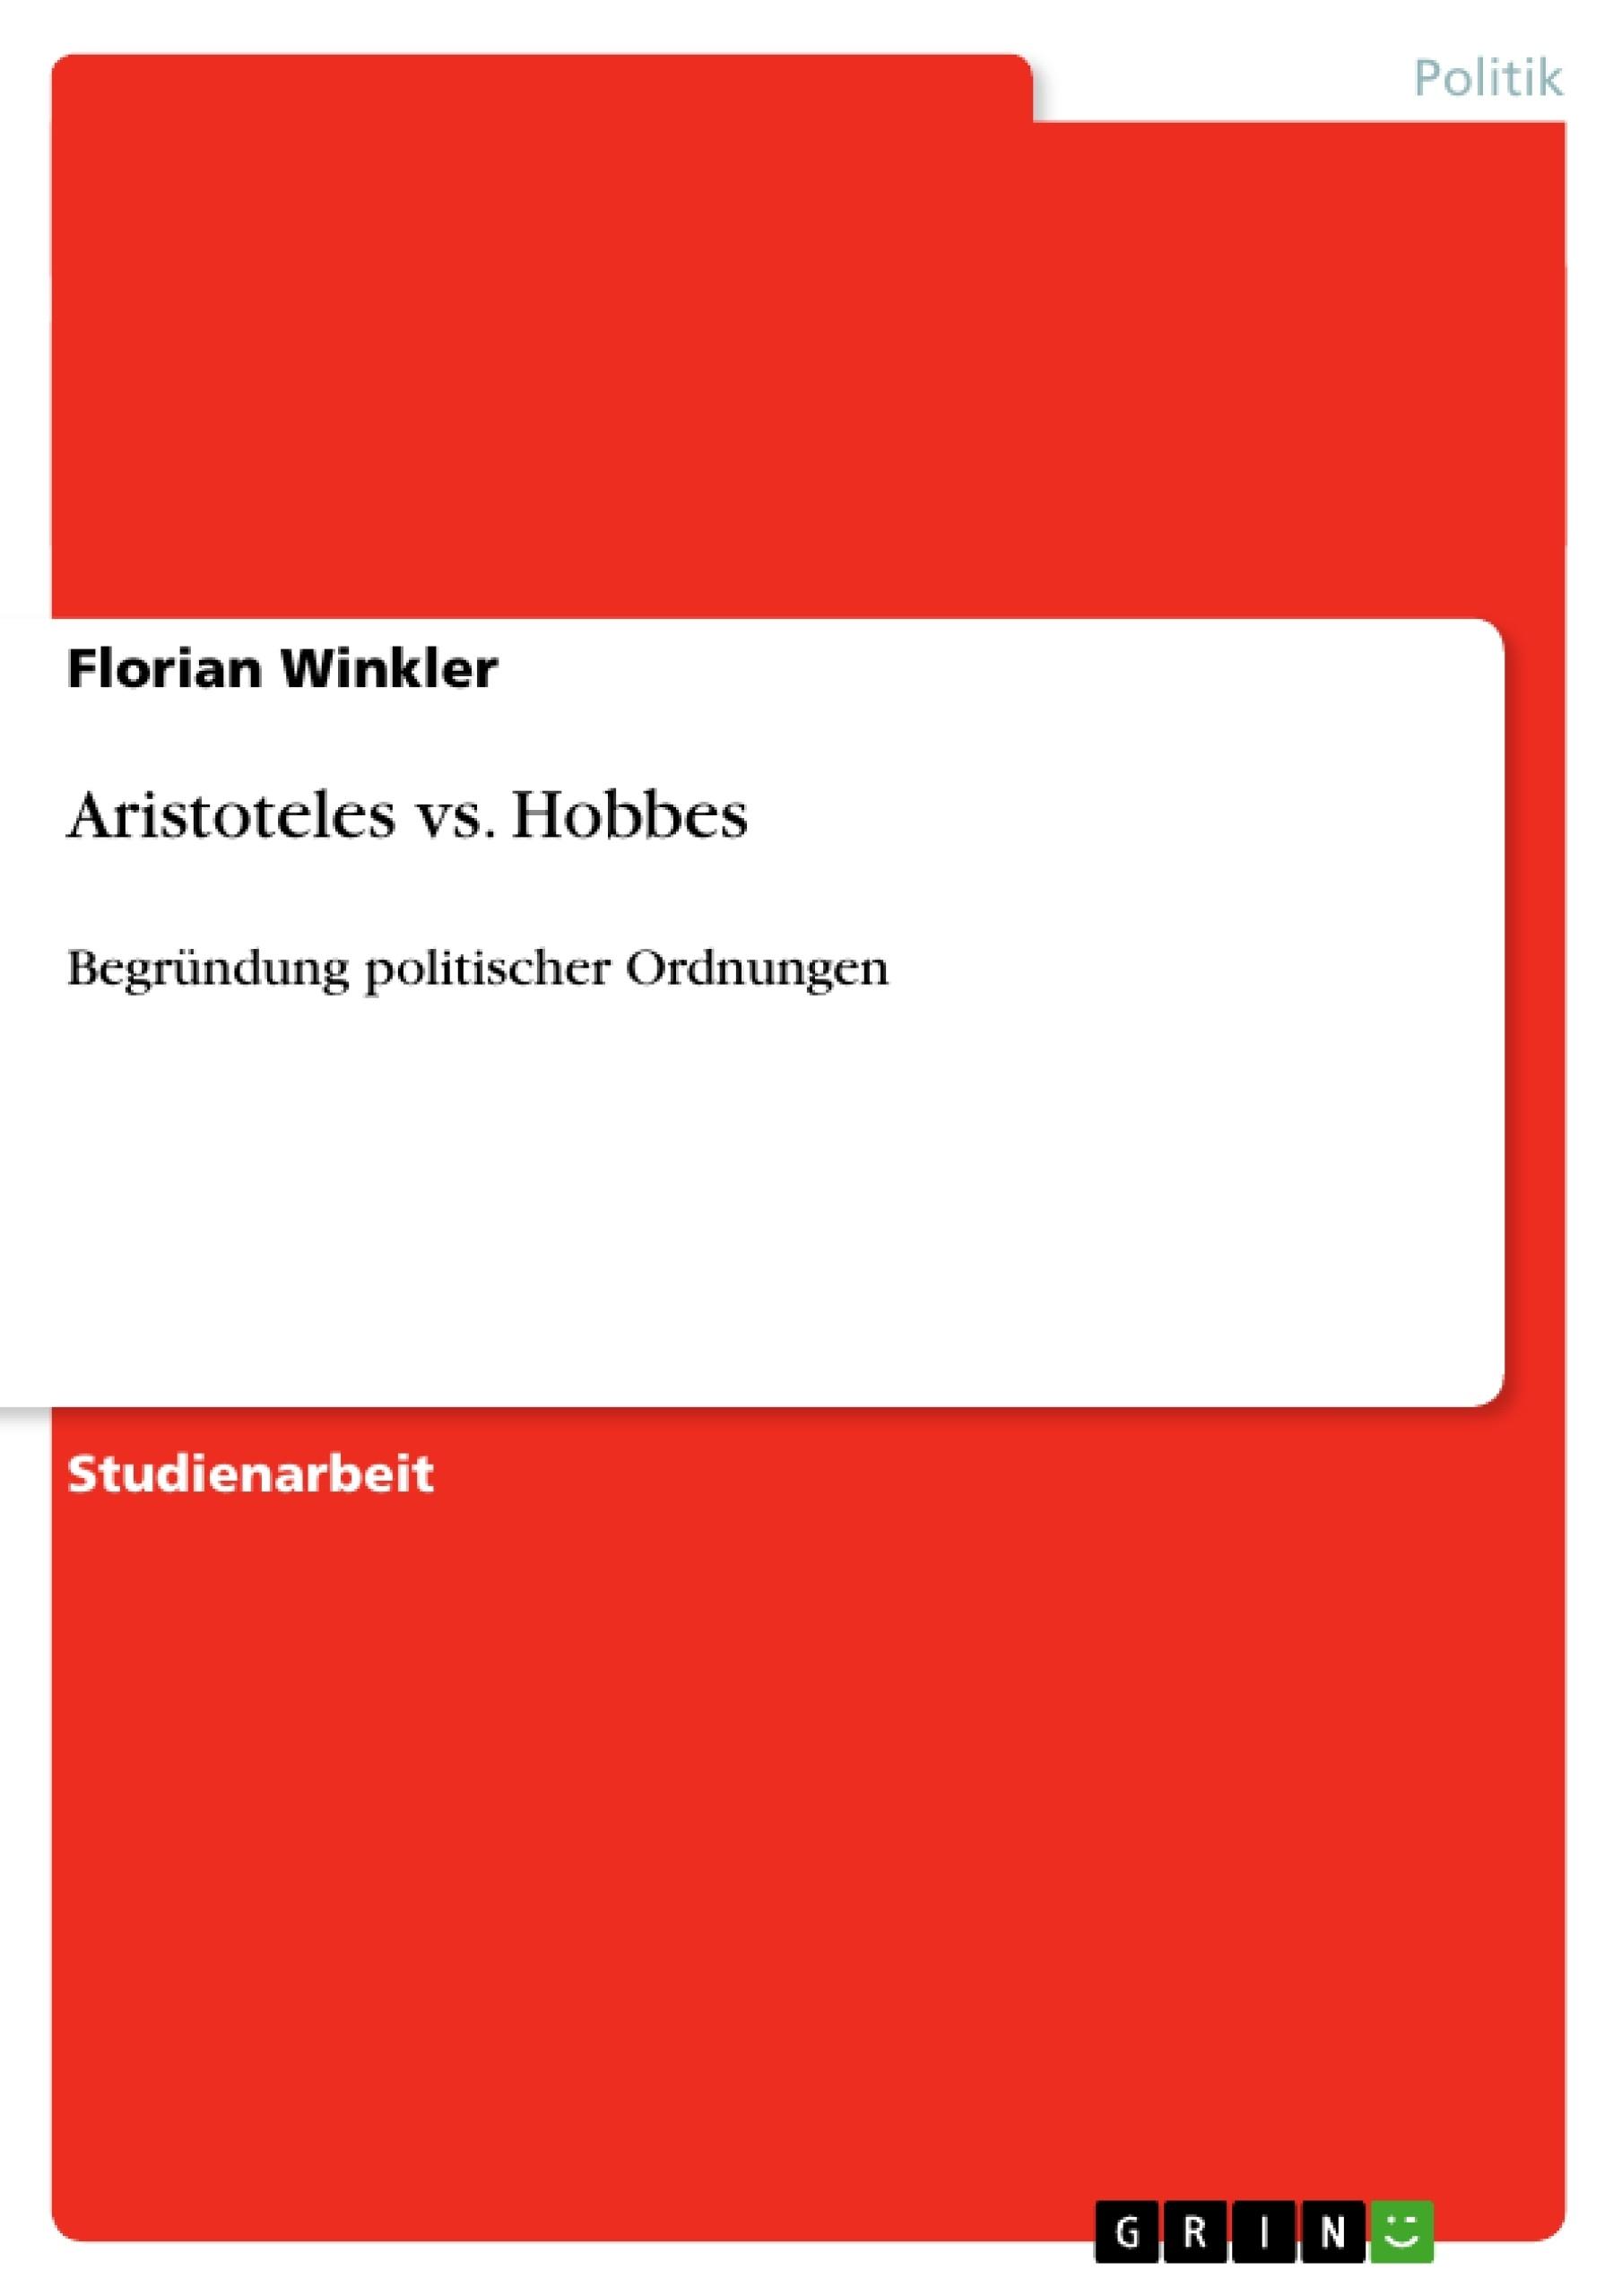 Titel: Aristoteles vs. Hobbes